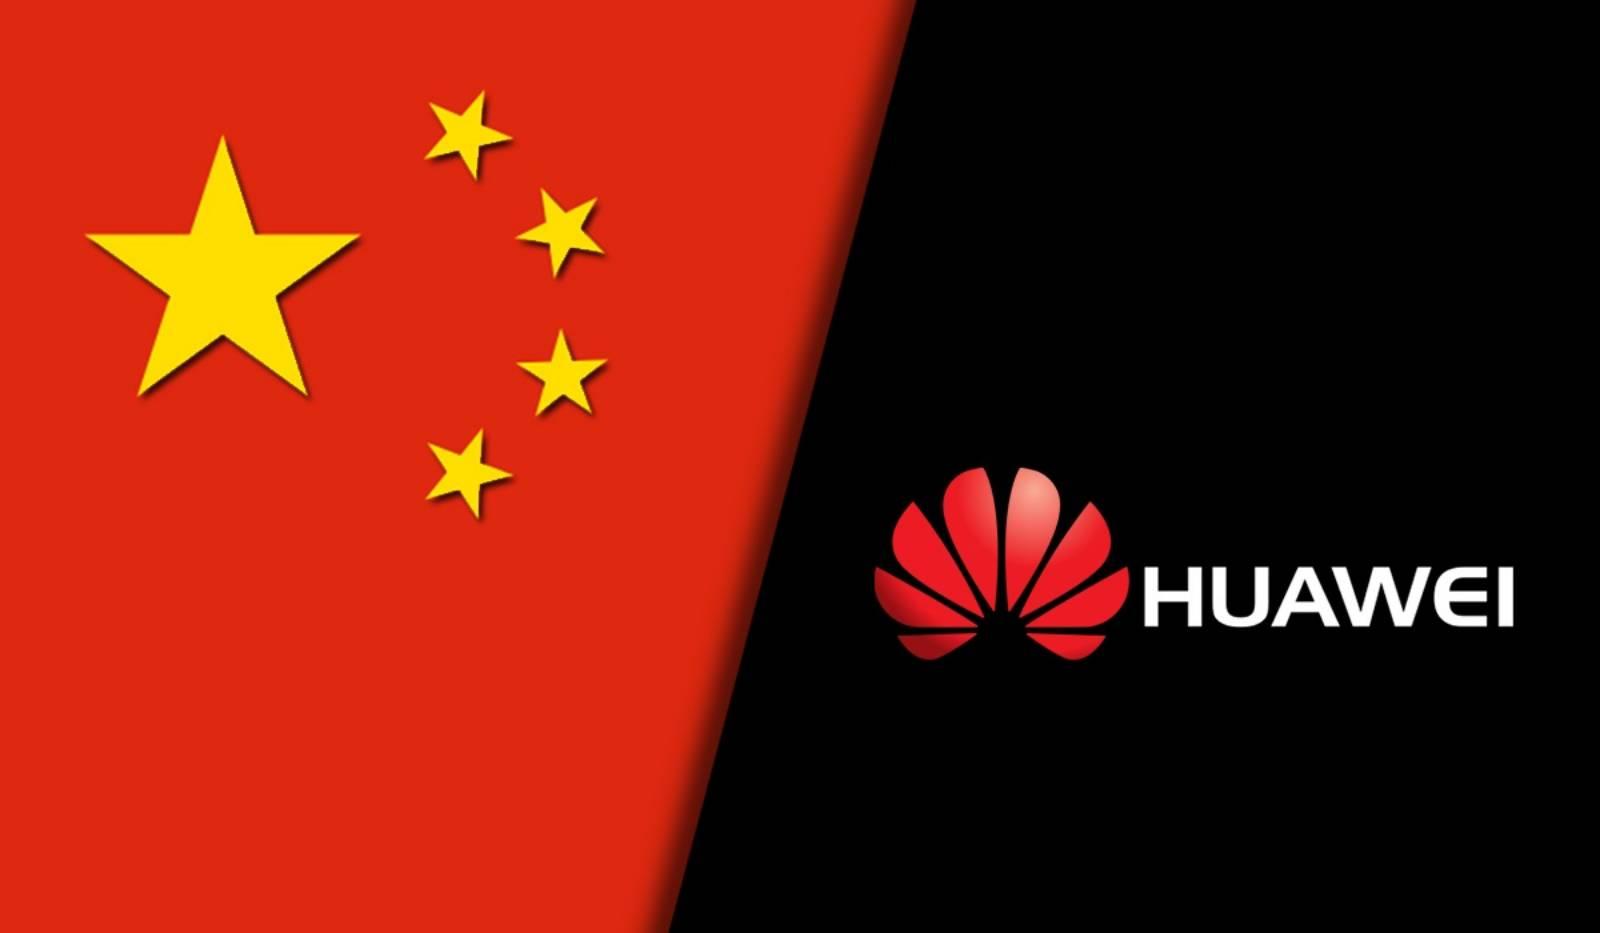 Anuntul Huawei UIMIT Clienti